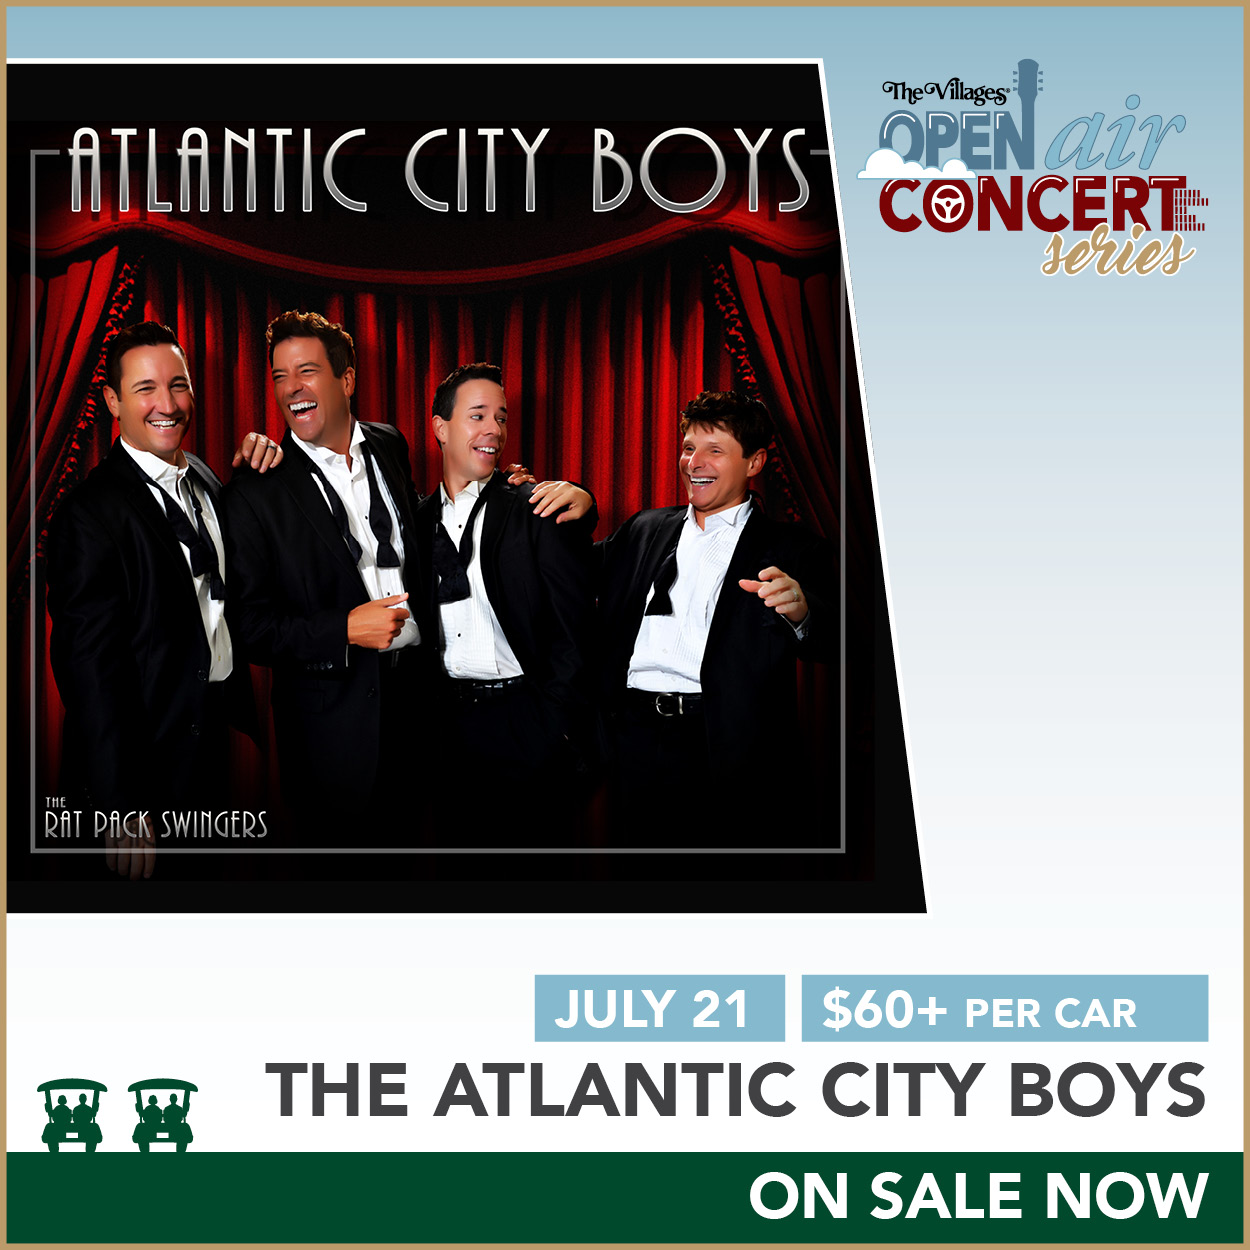 Open Air Concert Series – The Atlantic City Boys